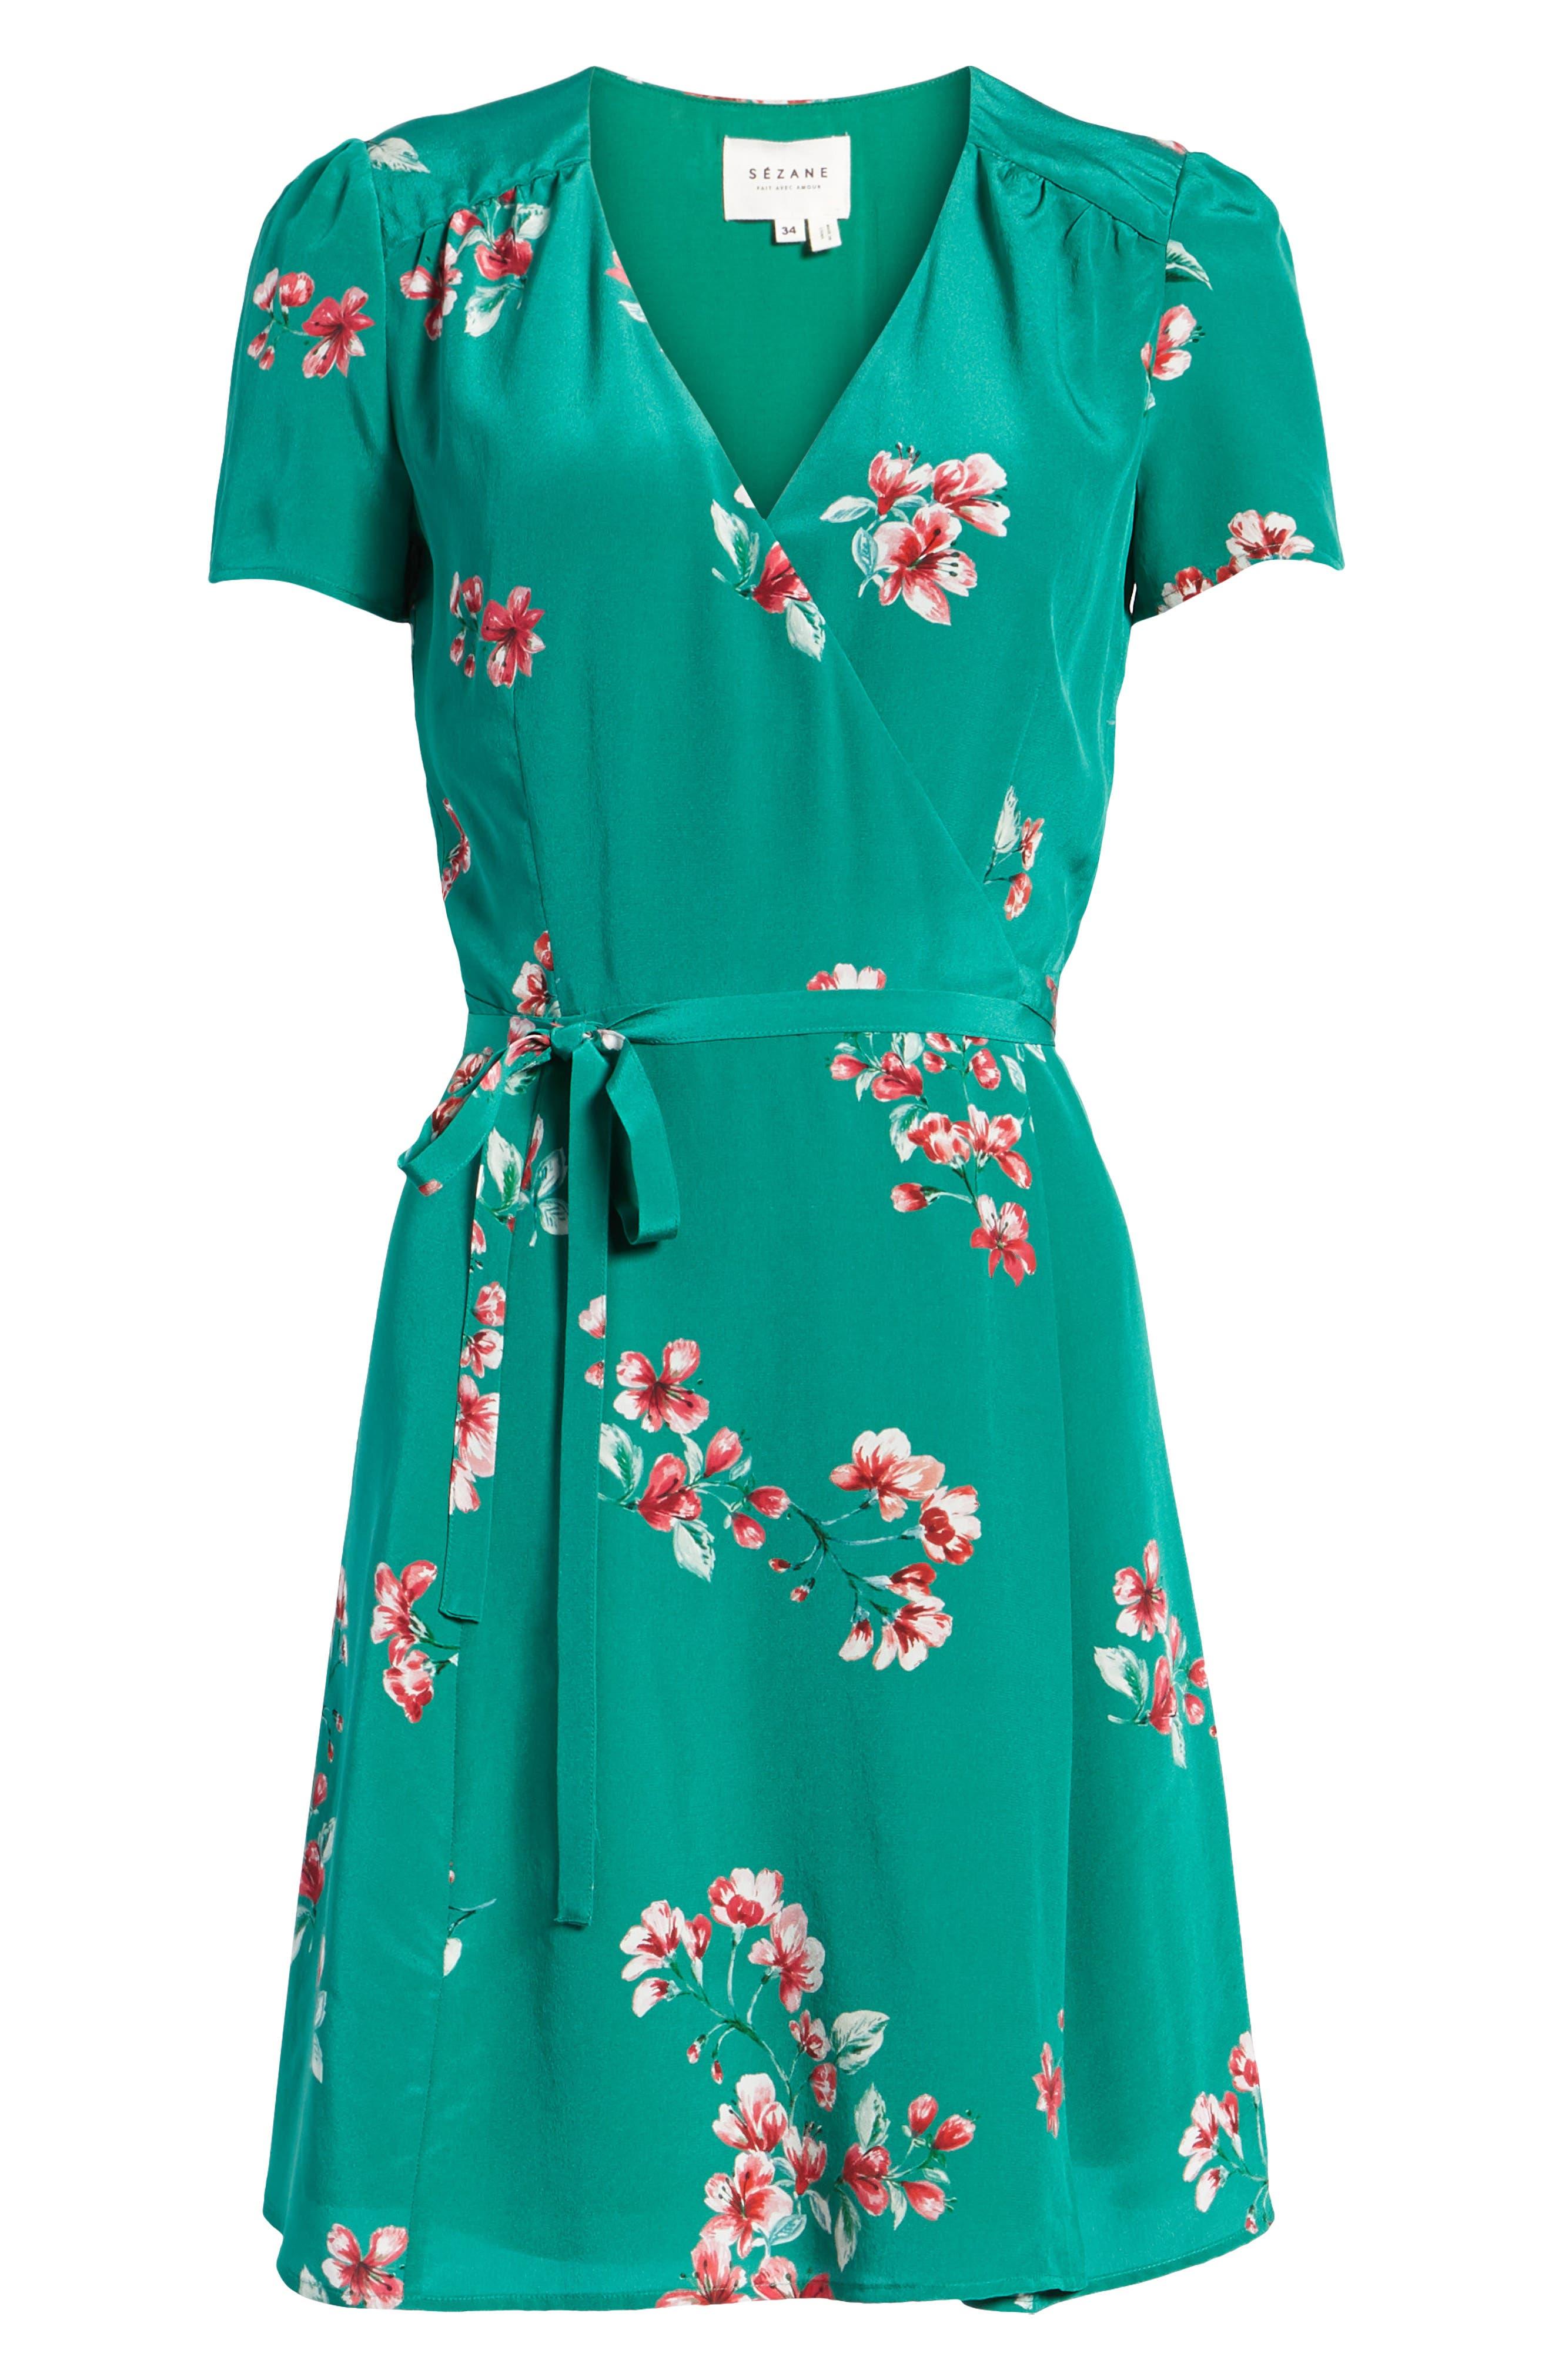 Anastasia Silk Wrap Dress,                             Alternate thumbnail 7, color,                             Bouquet Print On Green